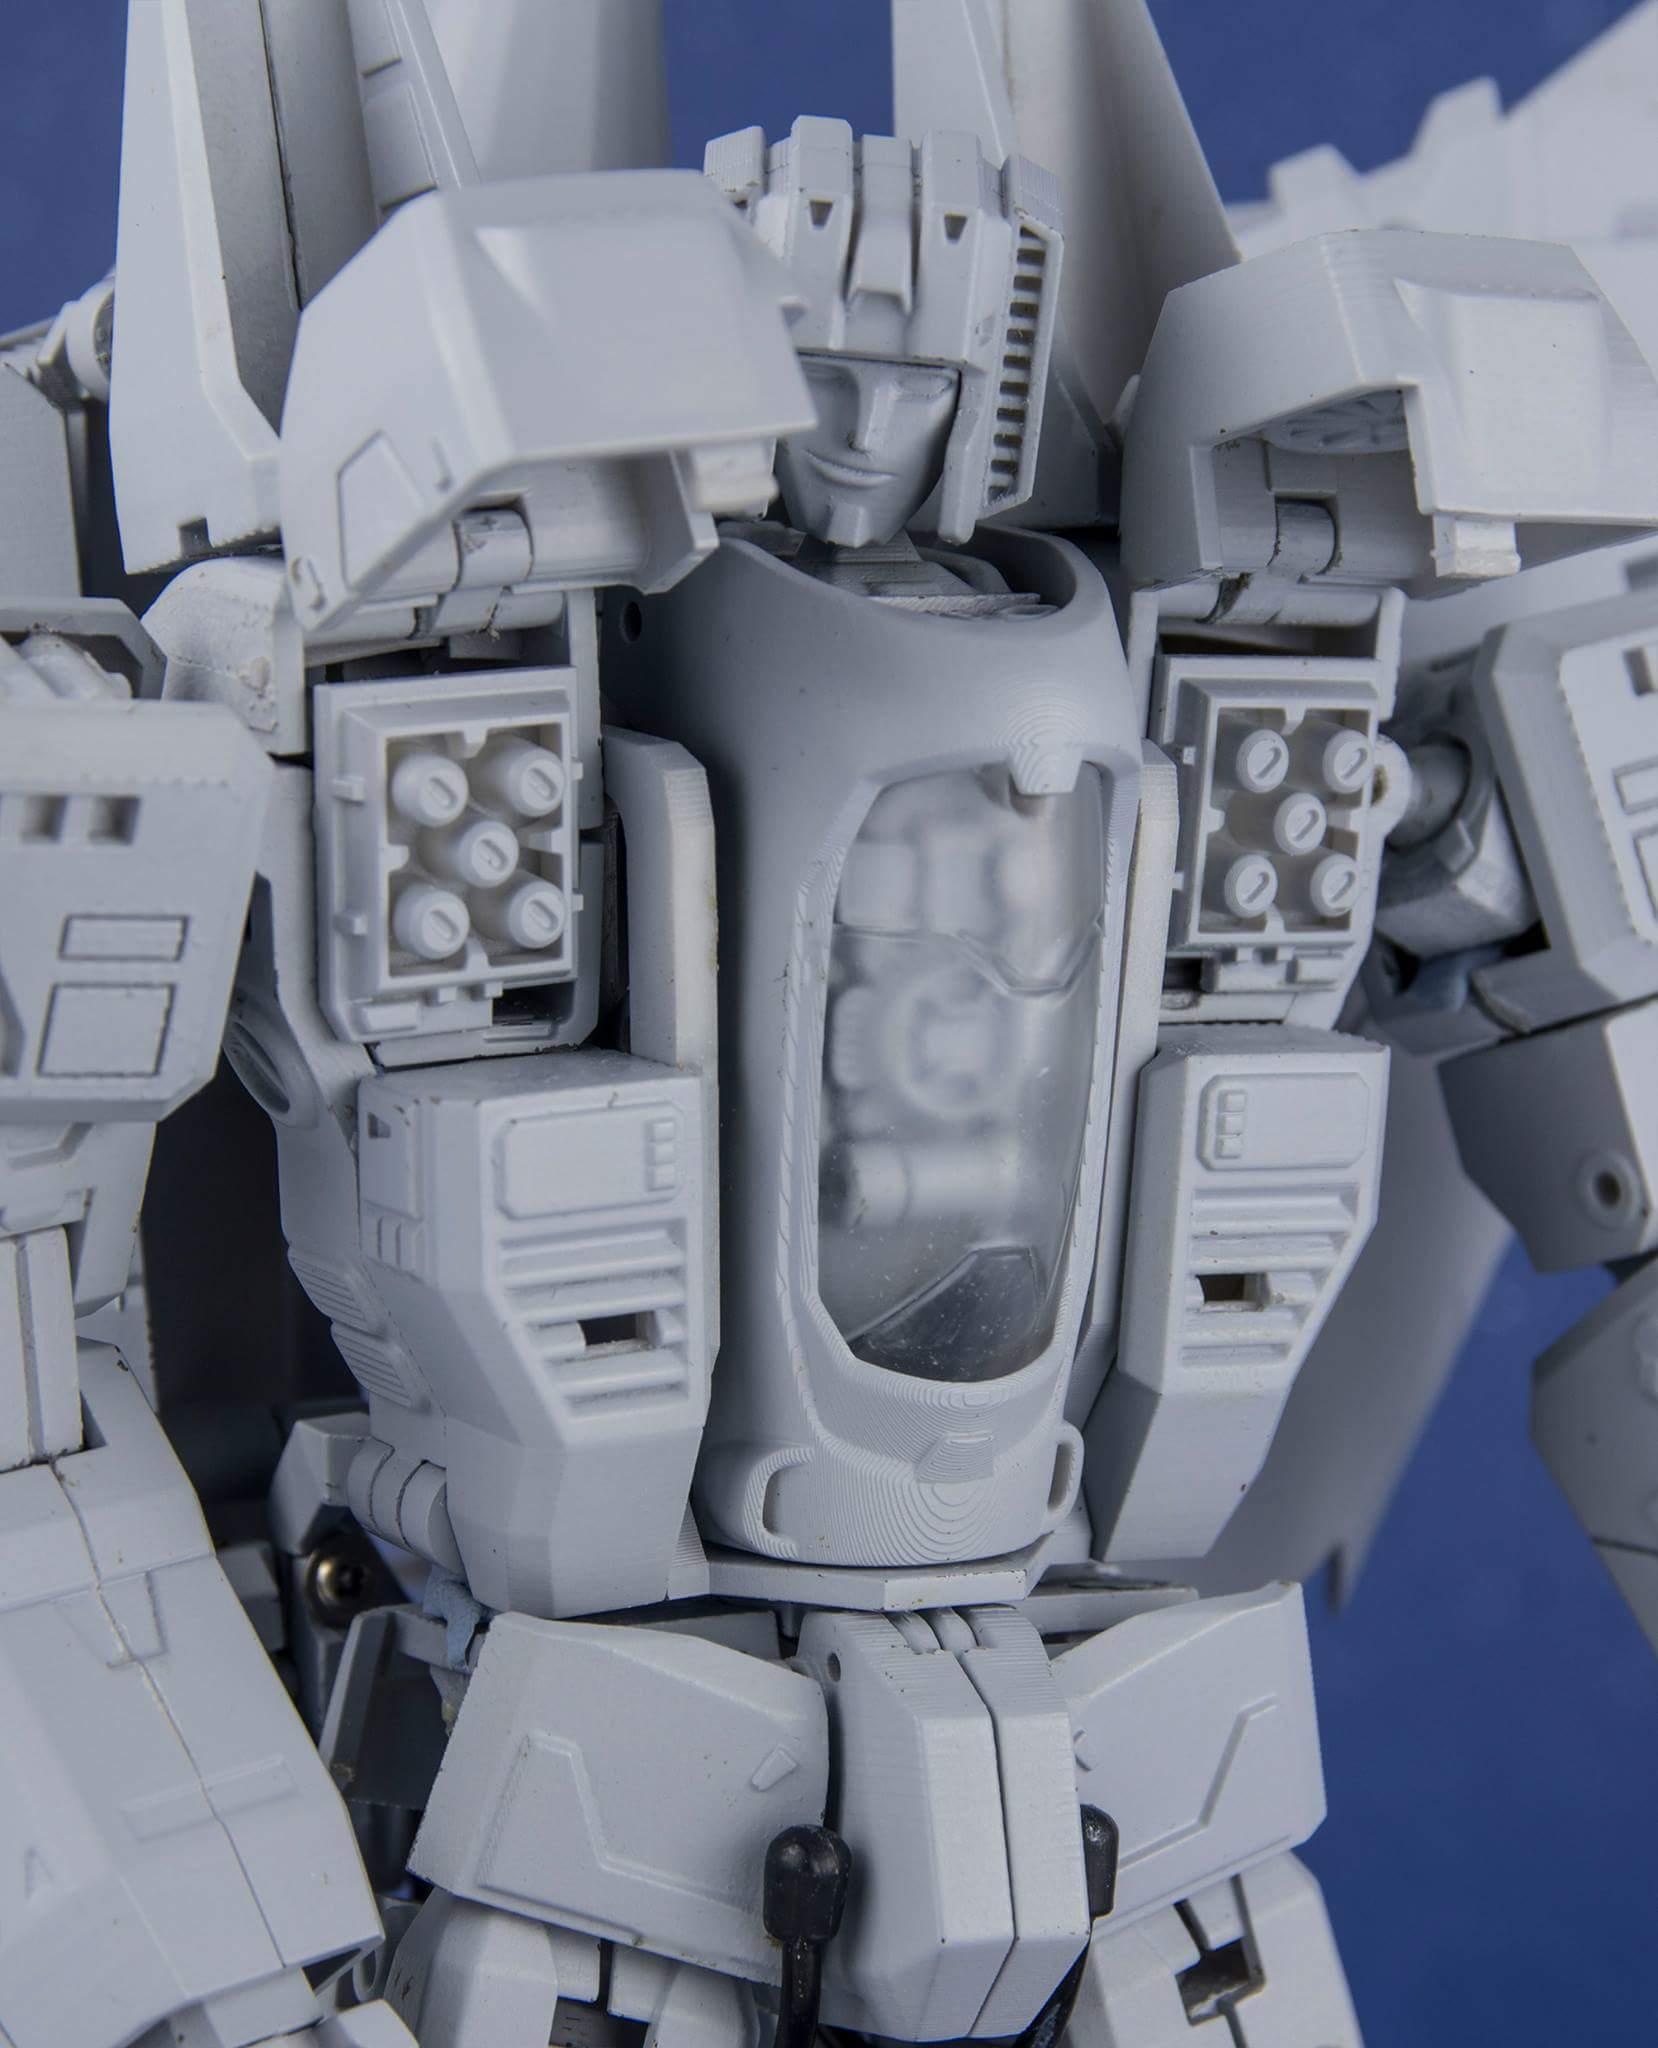 [MAAS Toys] Produit Tiers - Jouets TF de la gamme Cybertech Series (mode Cybertronien) + Gee Too (G2) - Page 2 ACx3vNiw_o